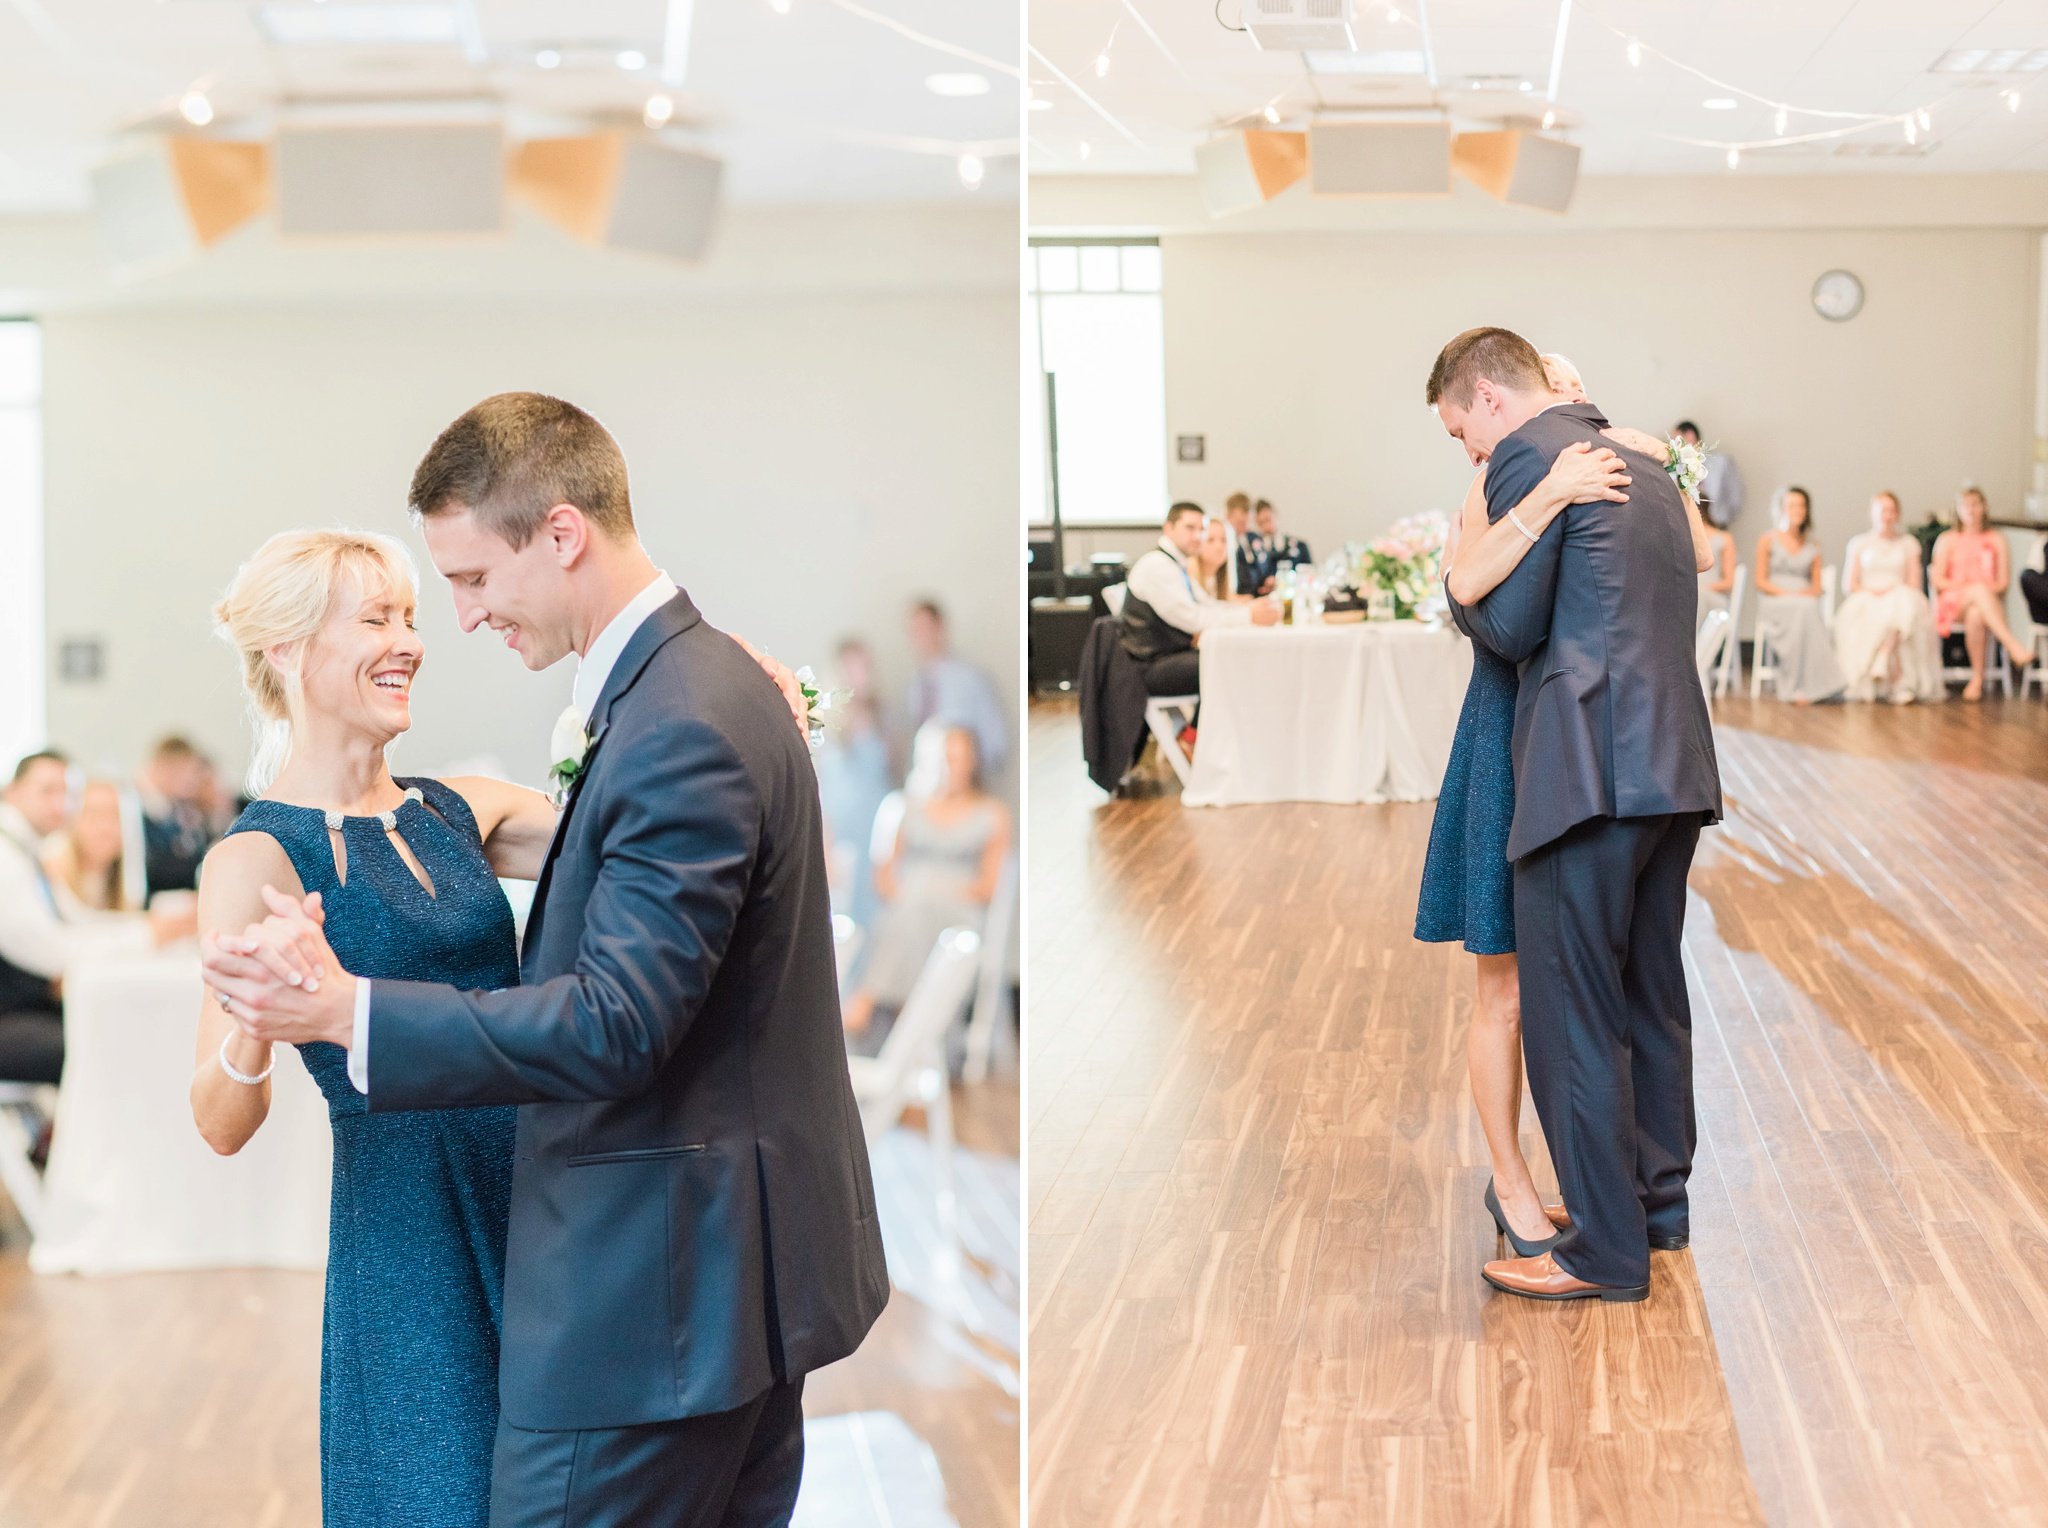 sunbury-ohio-wedding-hannah-johnathan_0142.jpg